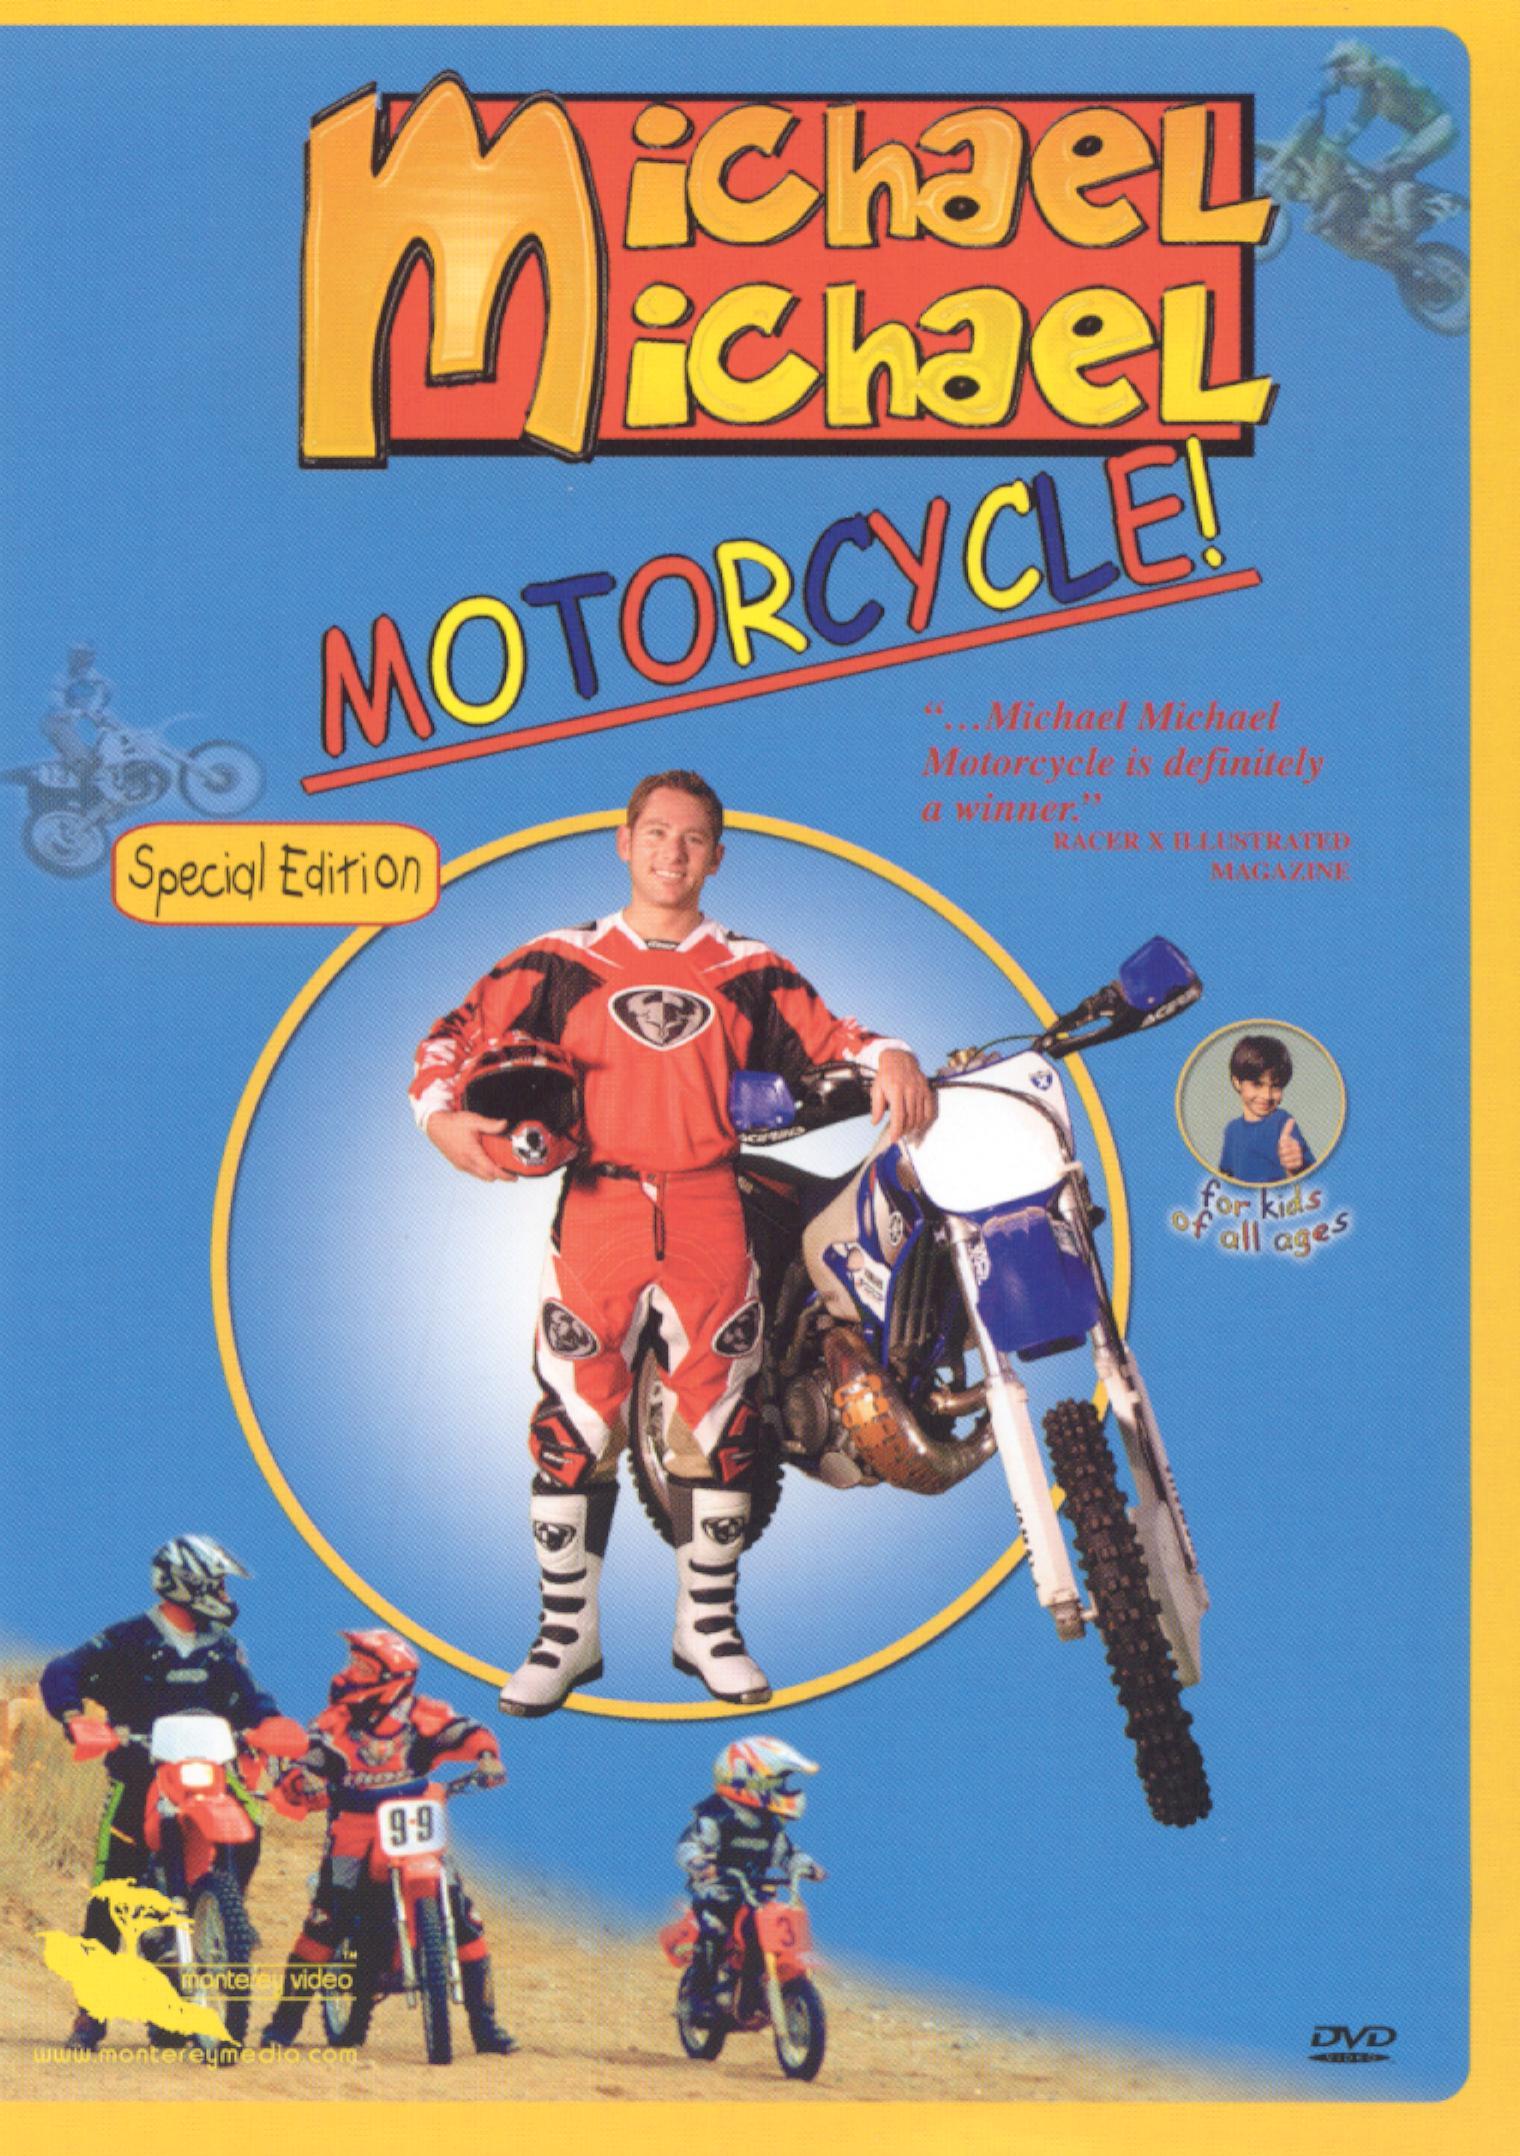 Michael Michael Motorcycle!